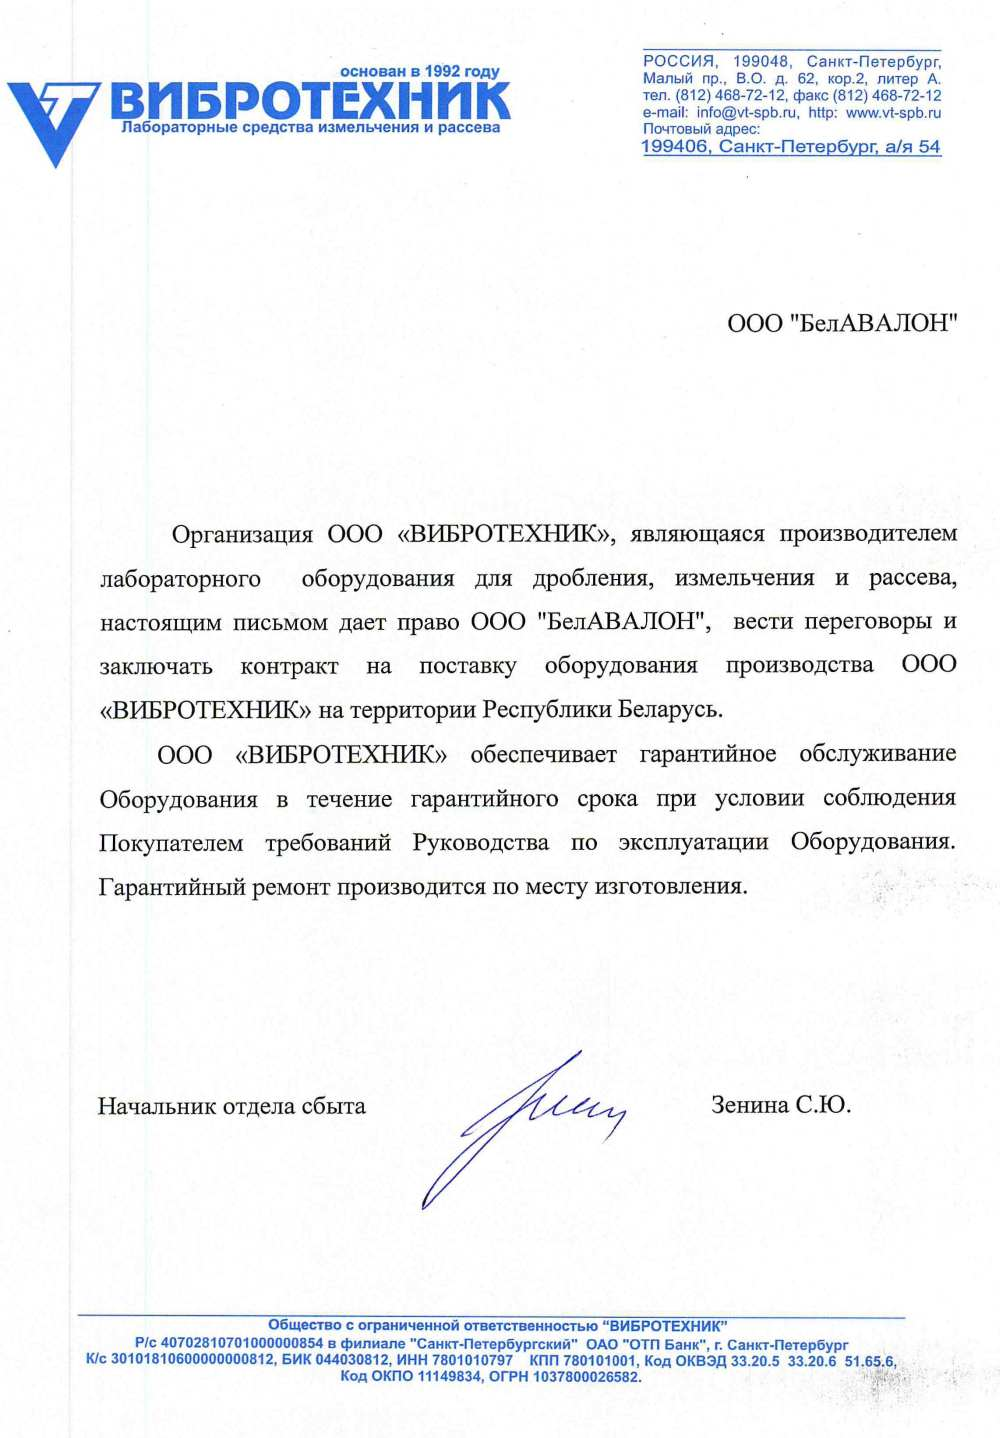 11.12. ООО «ВИБРОТЕХНИК»